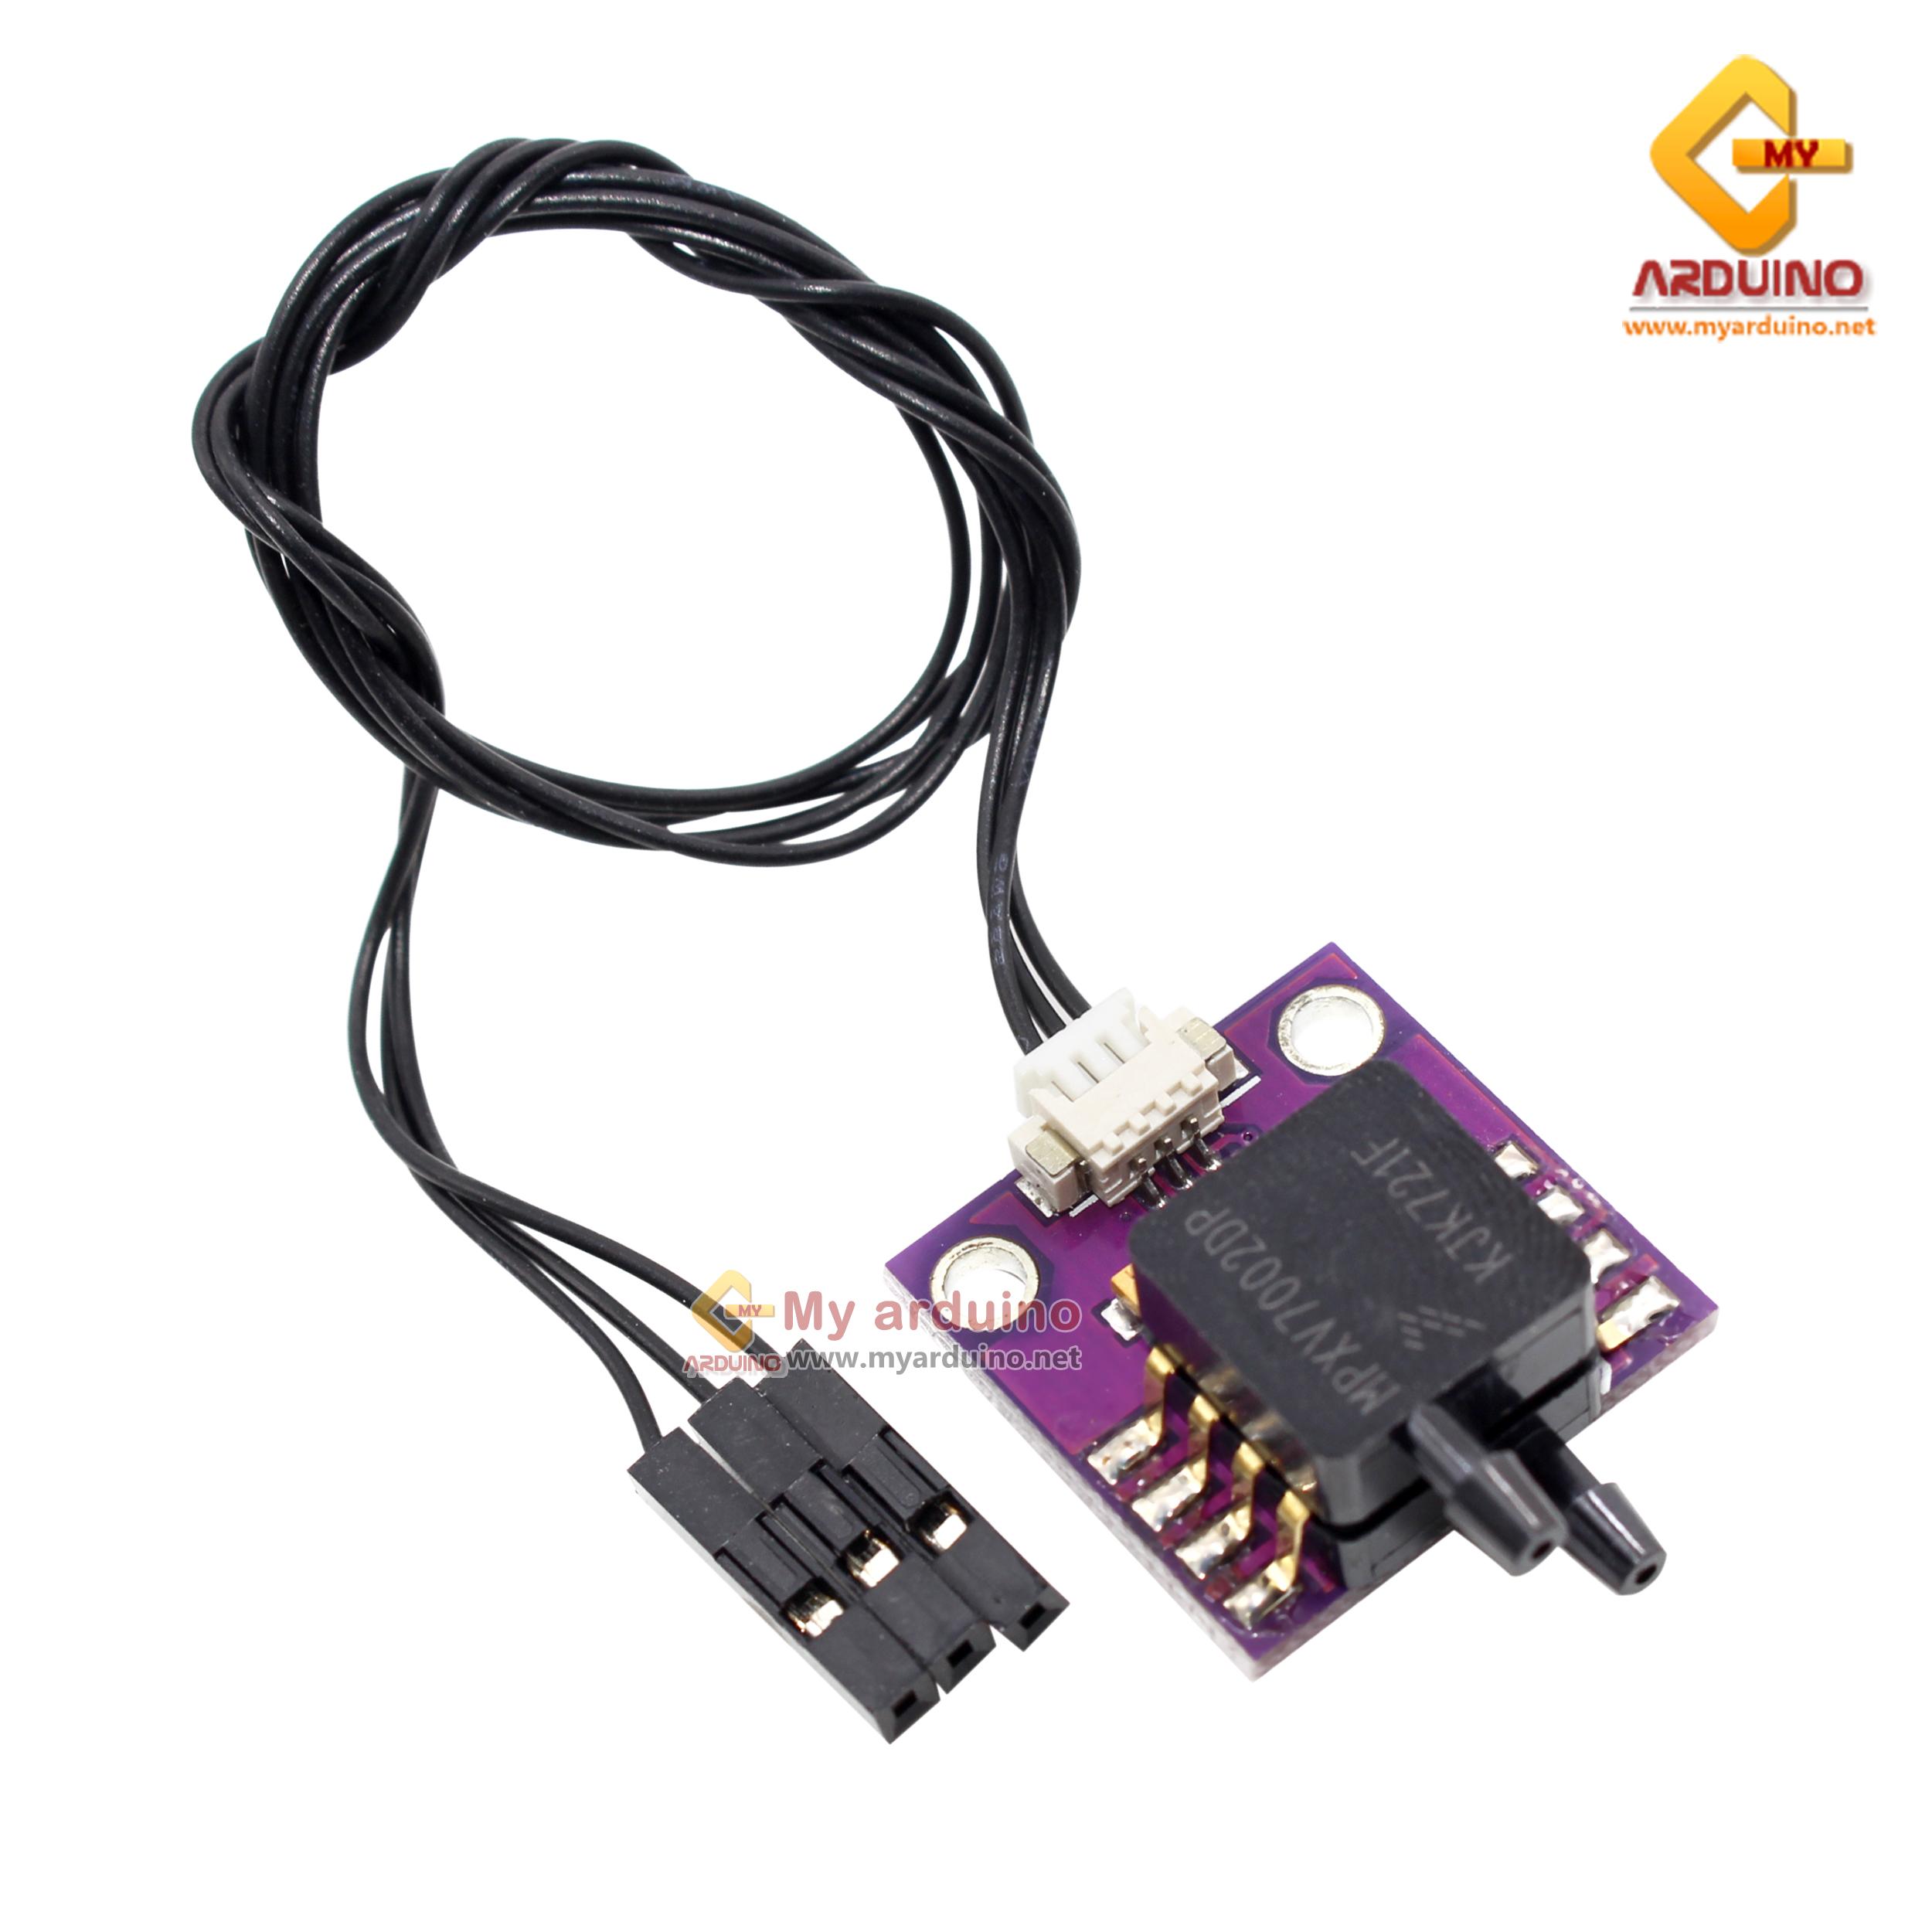 MPXV7002DP เซ็นเซอร์วัดความดัน Pressure Sensor DUAL PORT